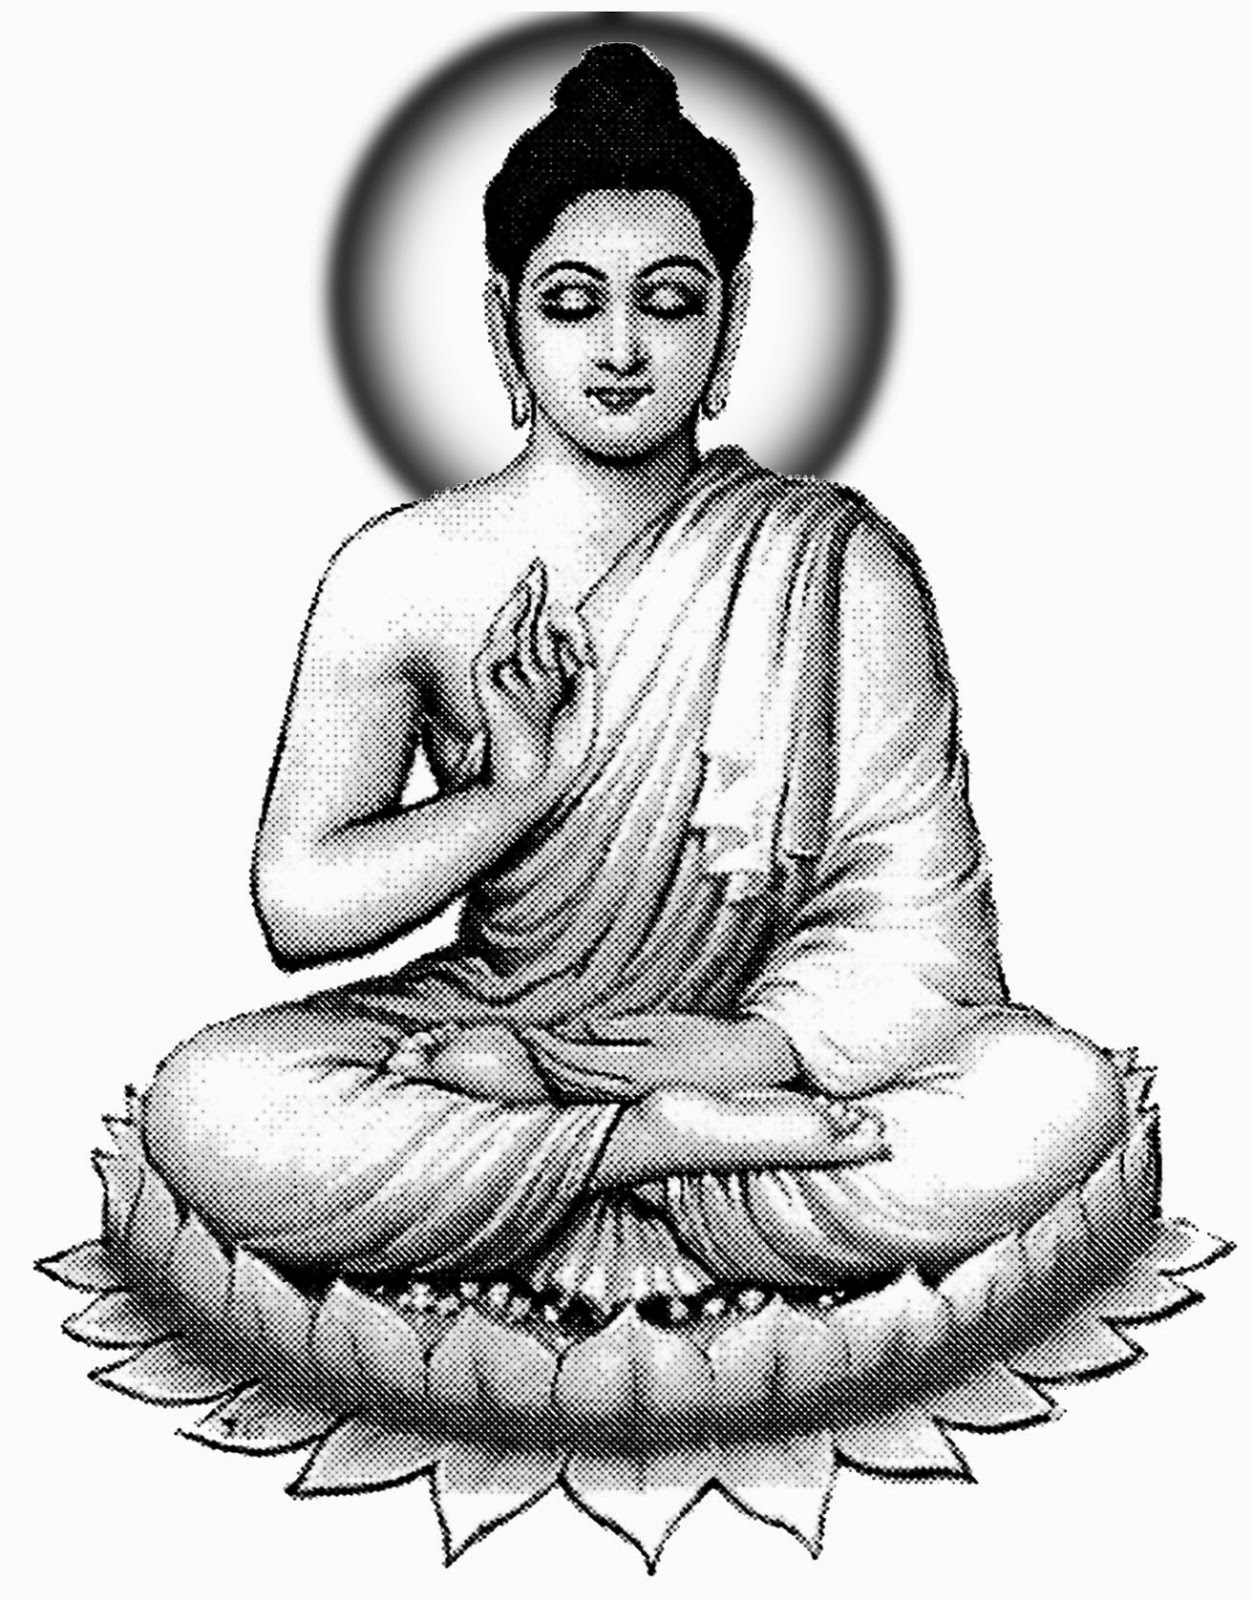 Hd Wallpaper Gautam Buddha Buddha Line Drawing At Getdrawings Com Free For Personal